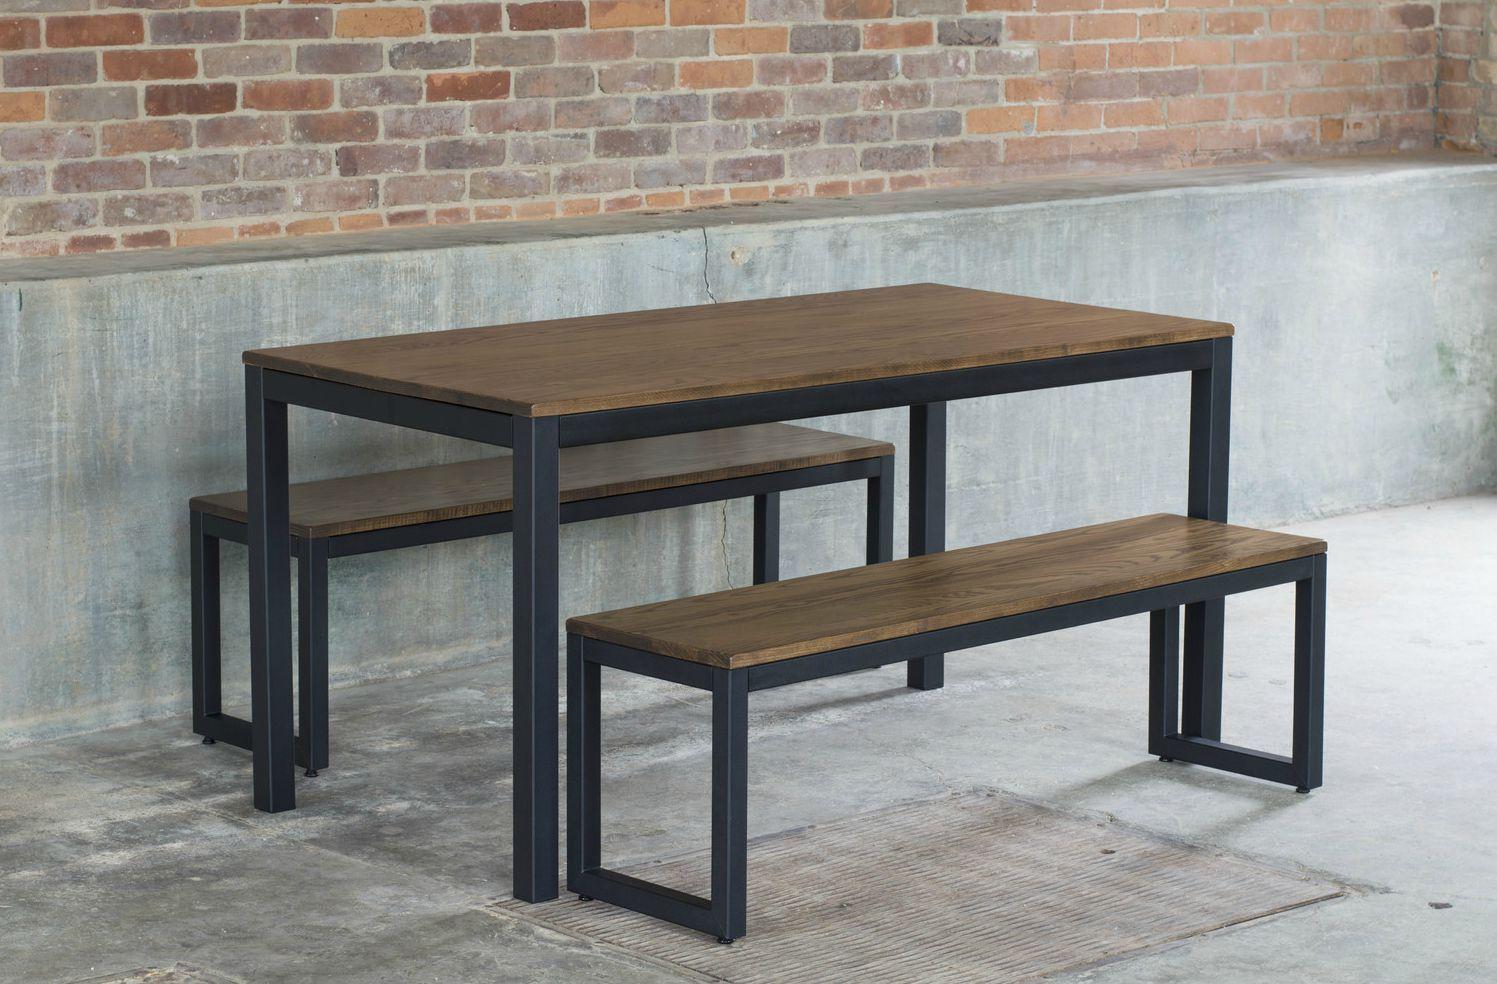 Stainless Steel Dining Room Tables Extraordinary Decor Look Alikes  Pb West Elm Crate & Barrel Look Alikes Inspiration